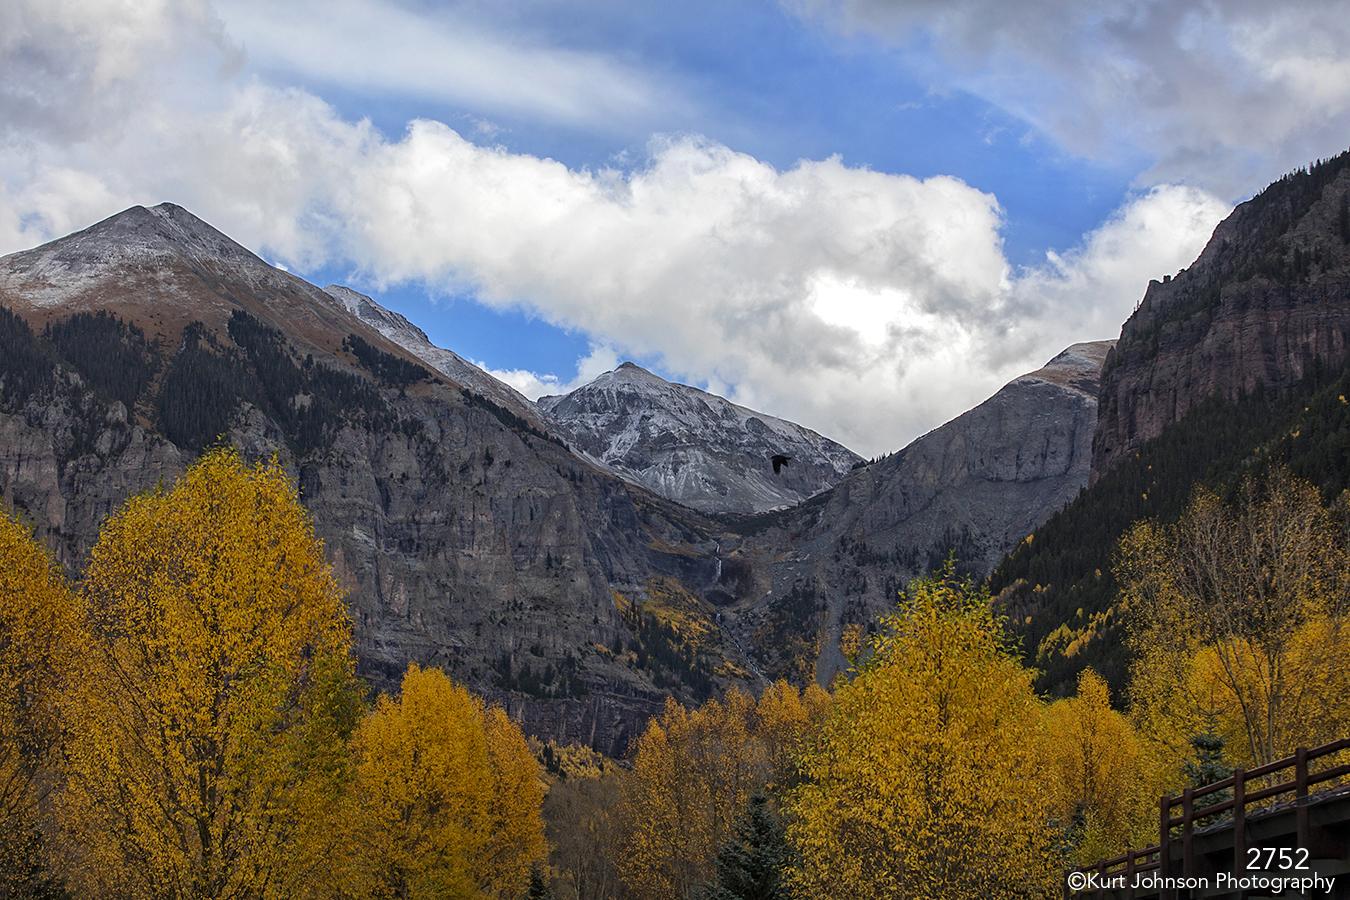 colorado landscape mountains birch trees yellow moutains